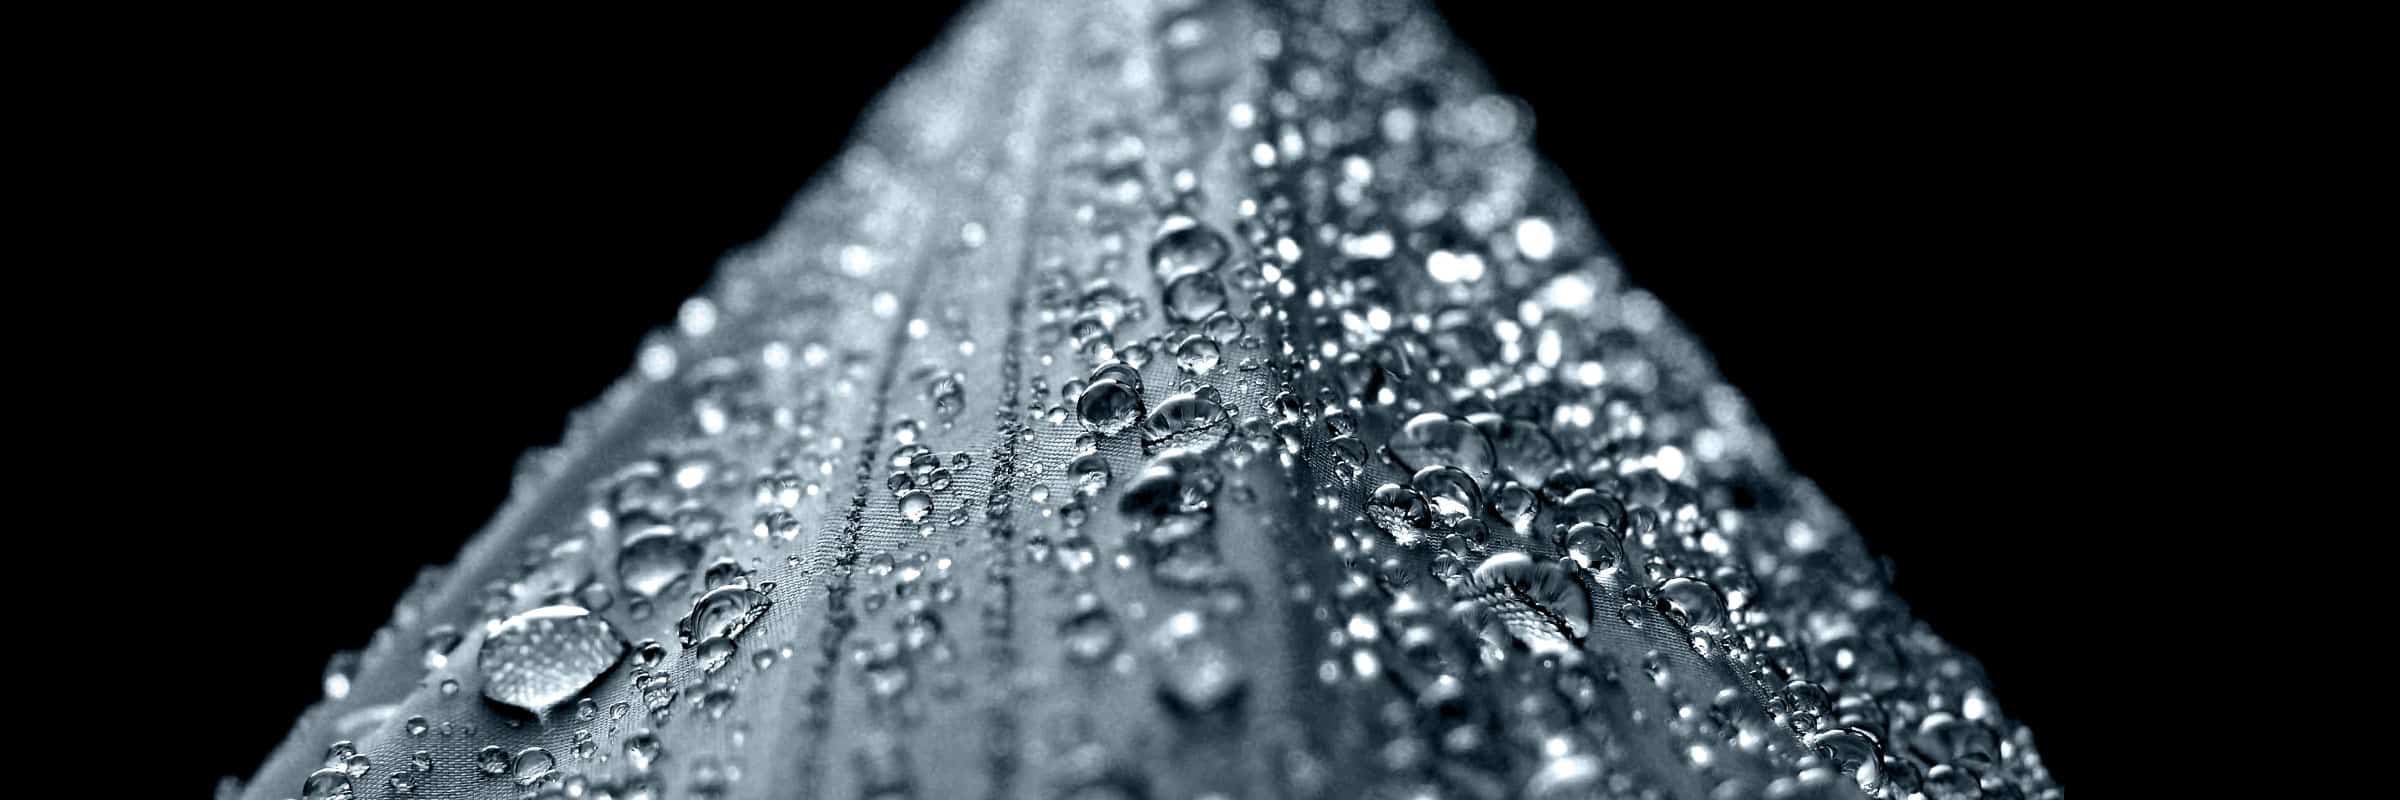 dry q waterproof technology